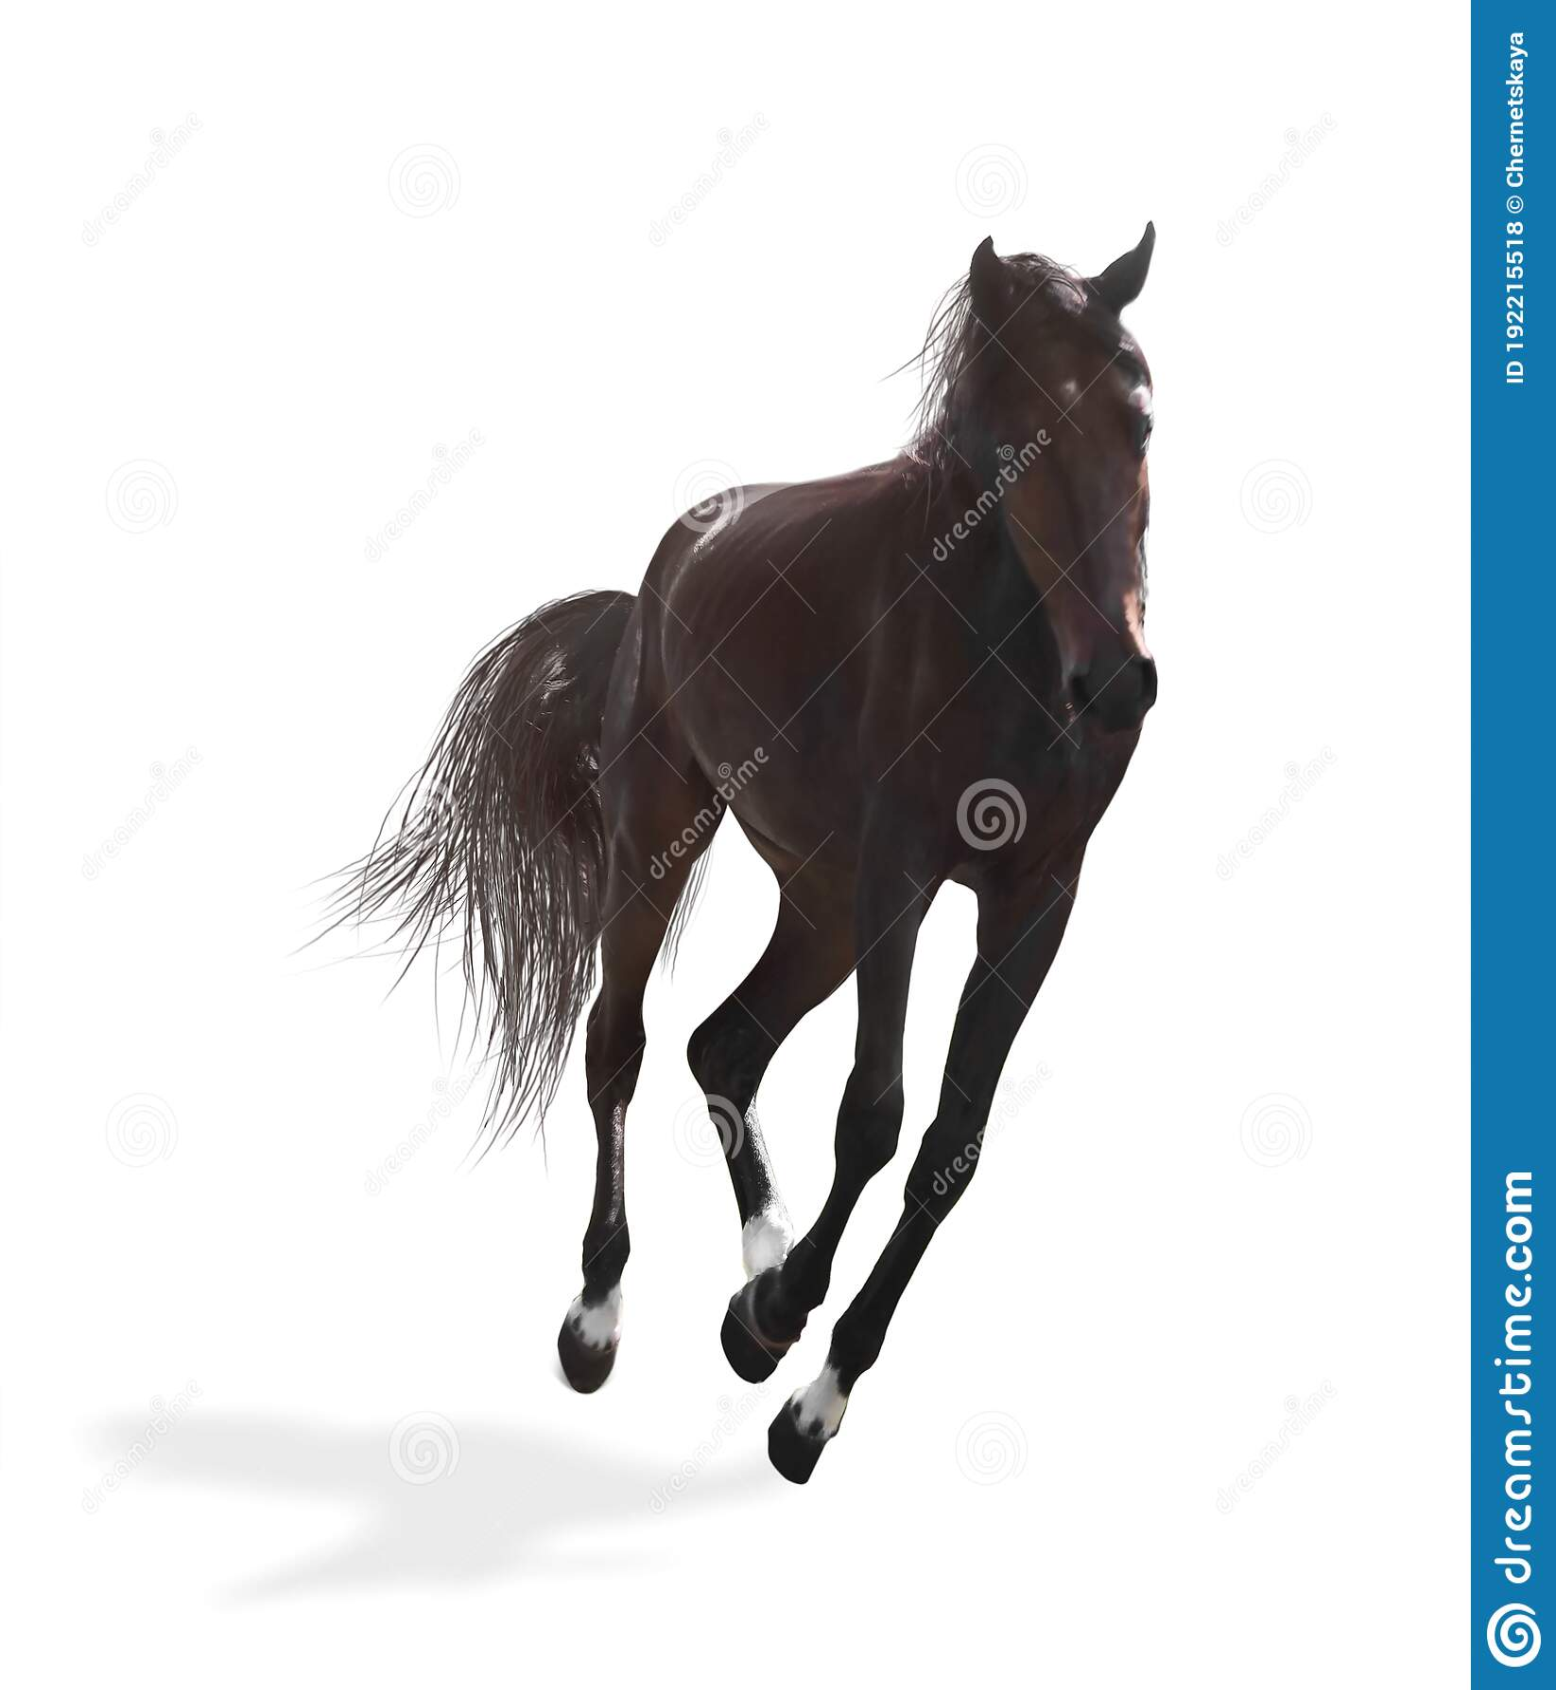 2 284 Beautiful Dark Bay Horse Photos Free Royalty Free Stock Photos From Dreamstime